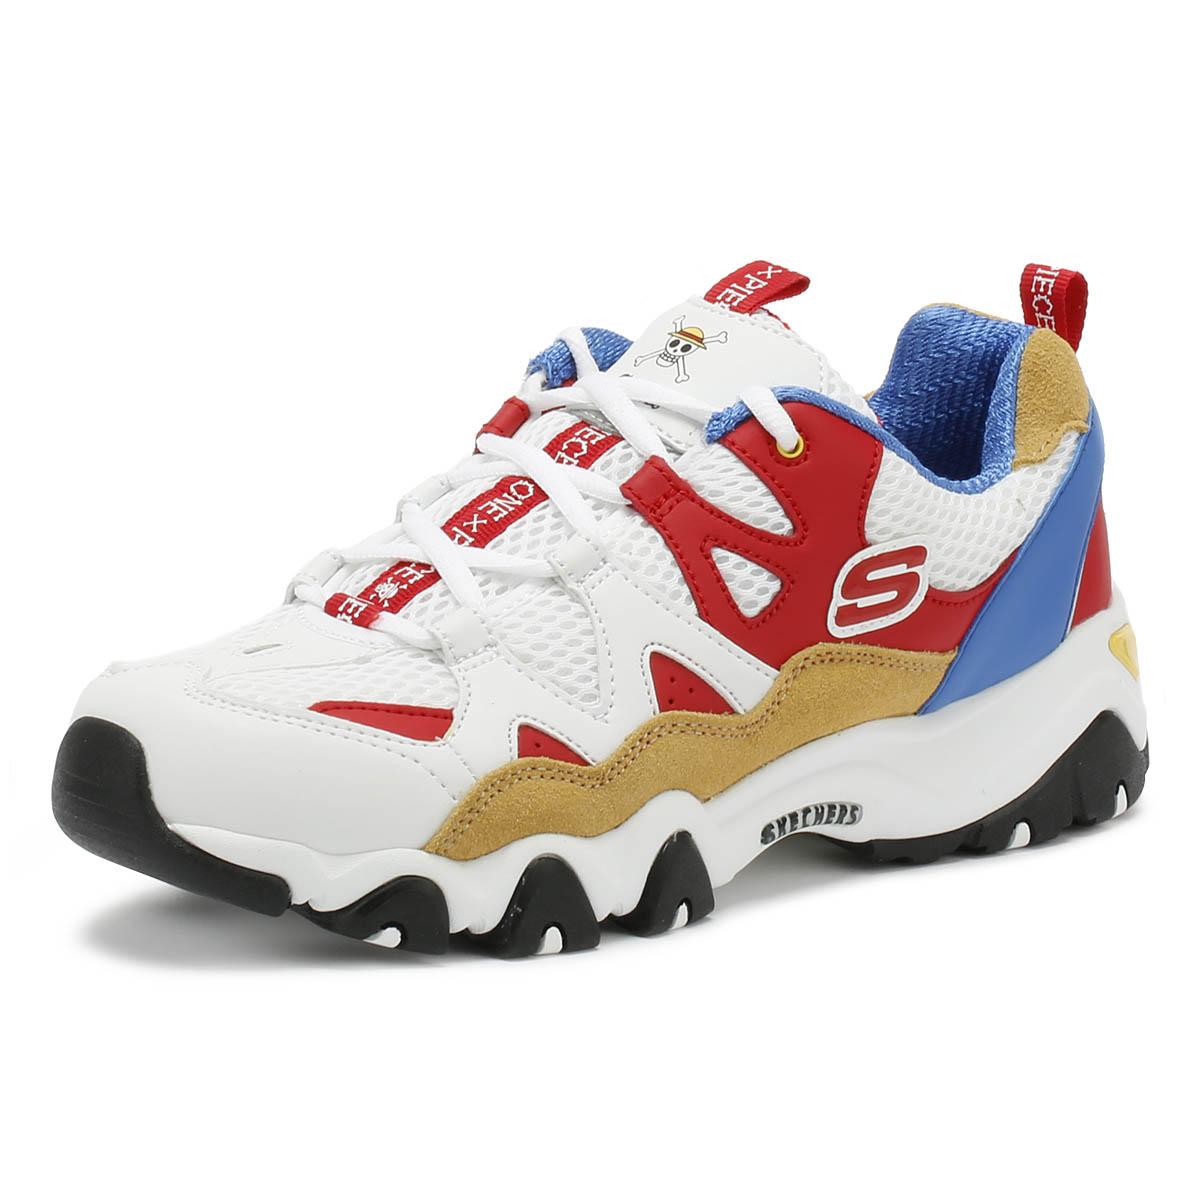 2019 Skechers x One Piece D LItes 3 Shoes Sneakers WhiteBlackOrange(Ace) | eBay